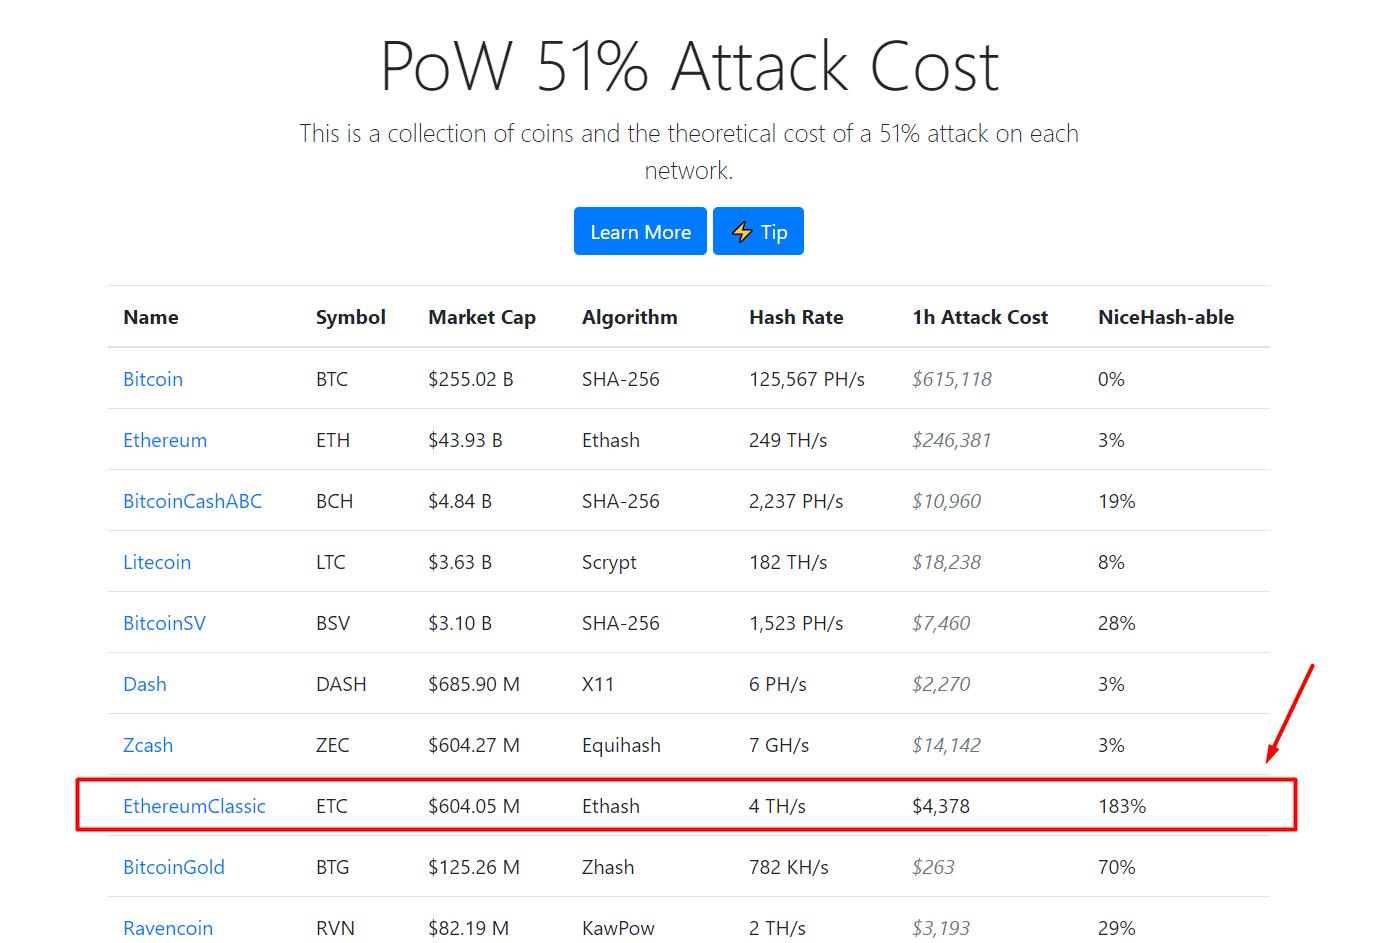 pow_51_attack_cost